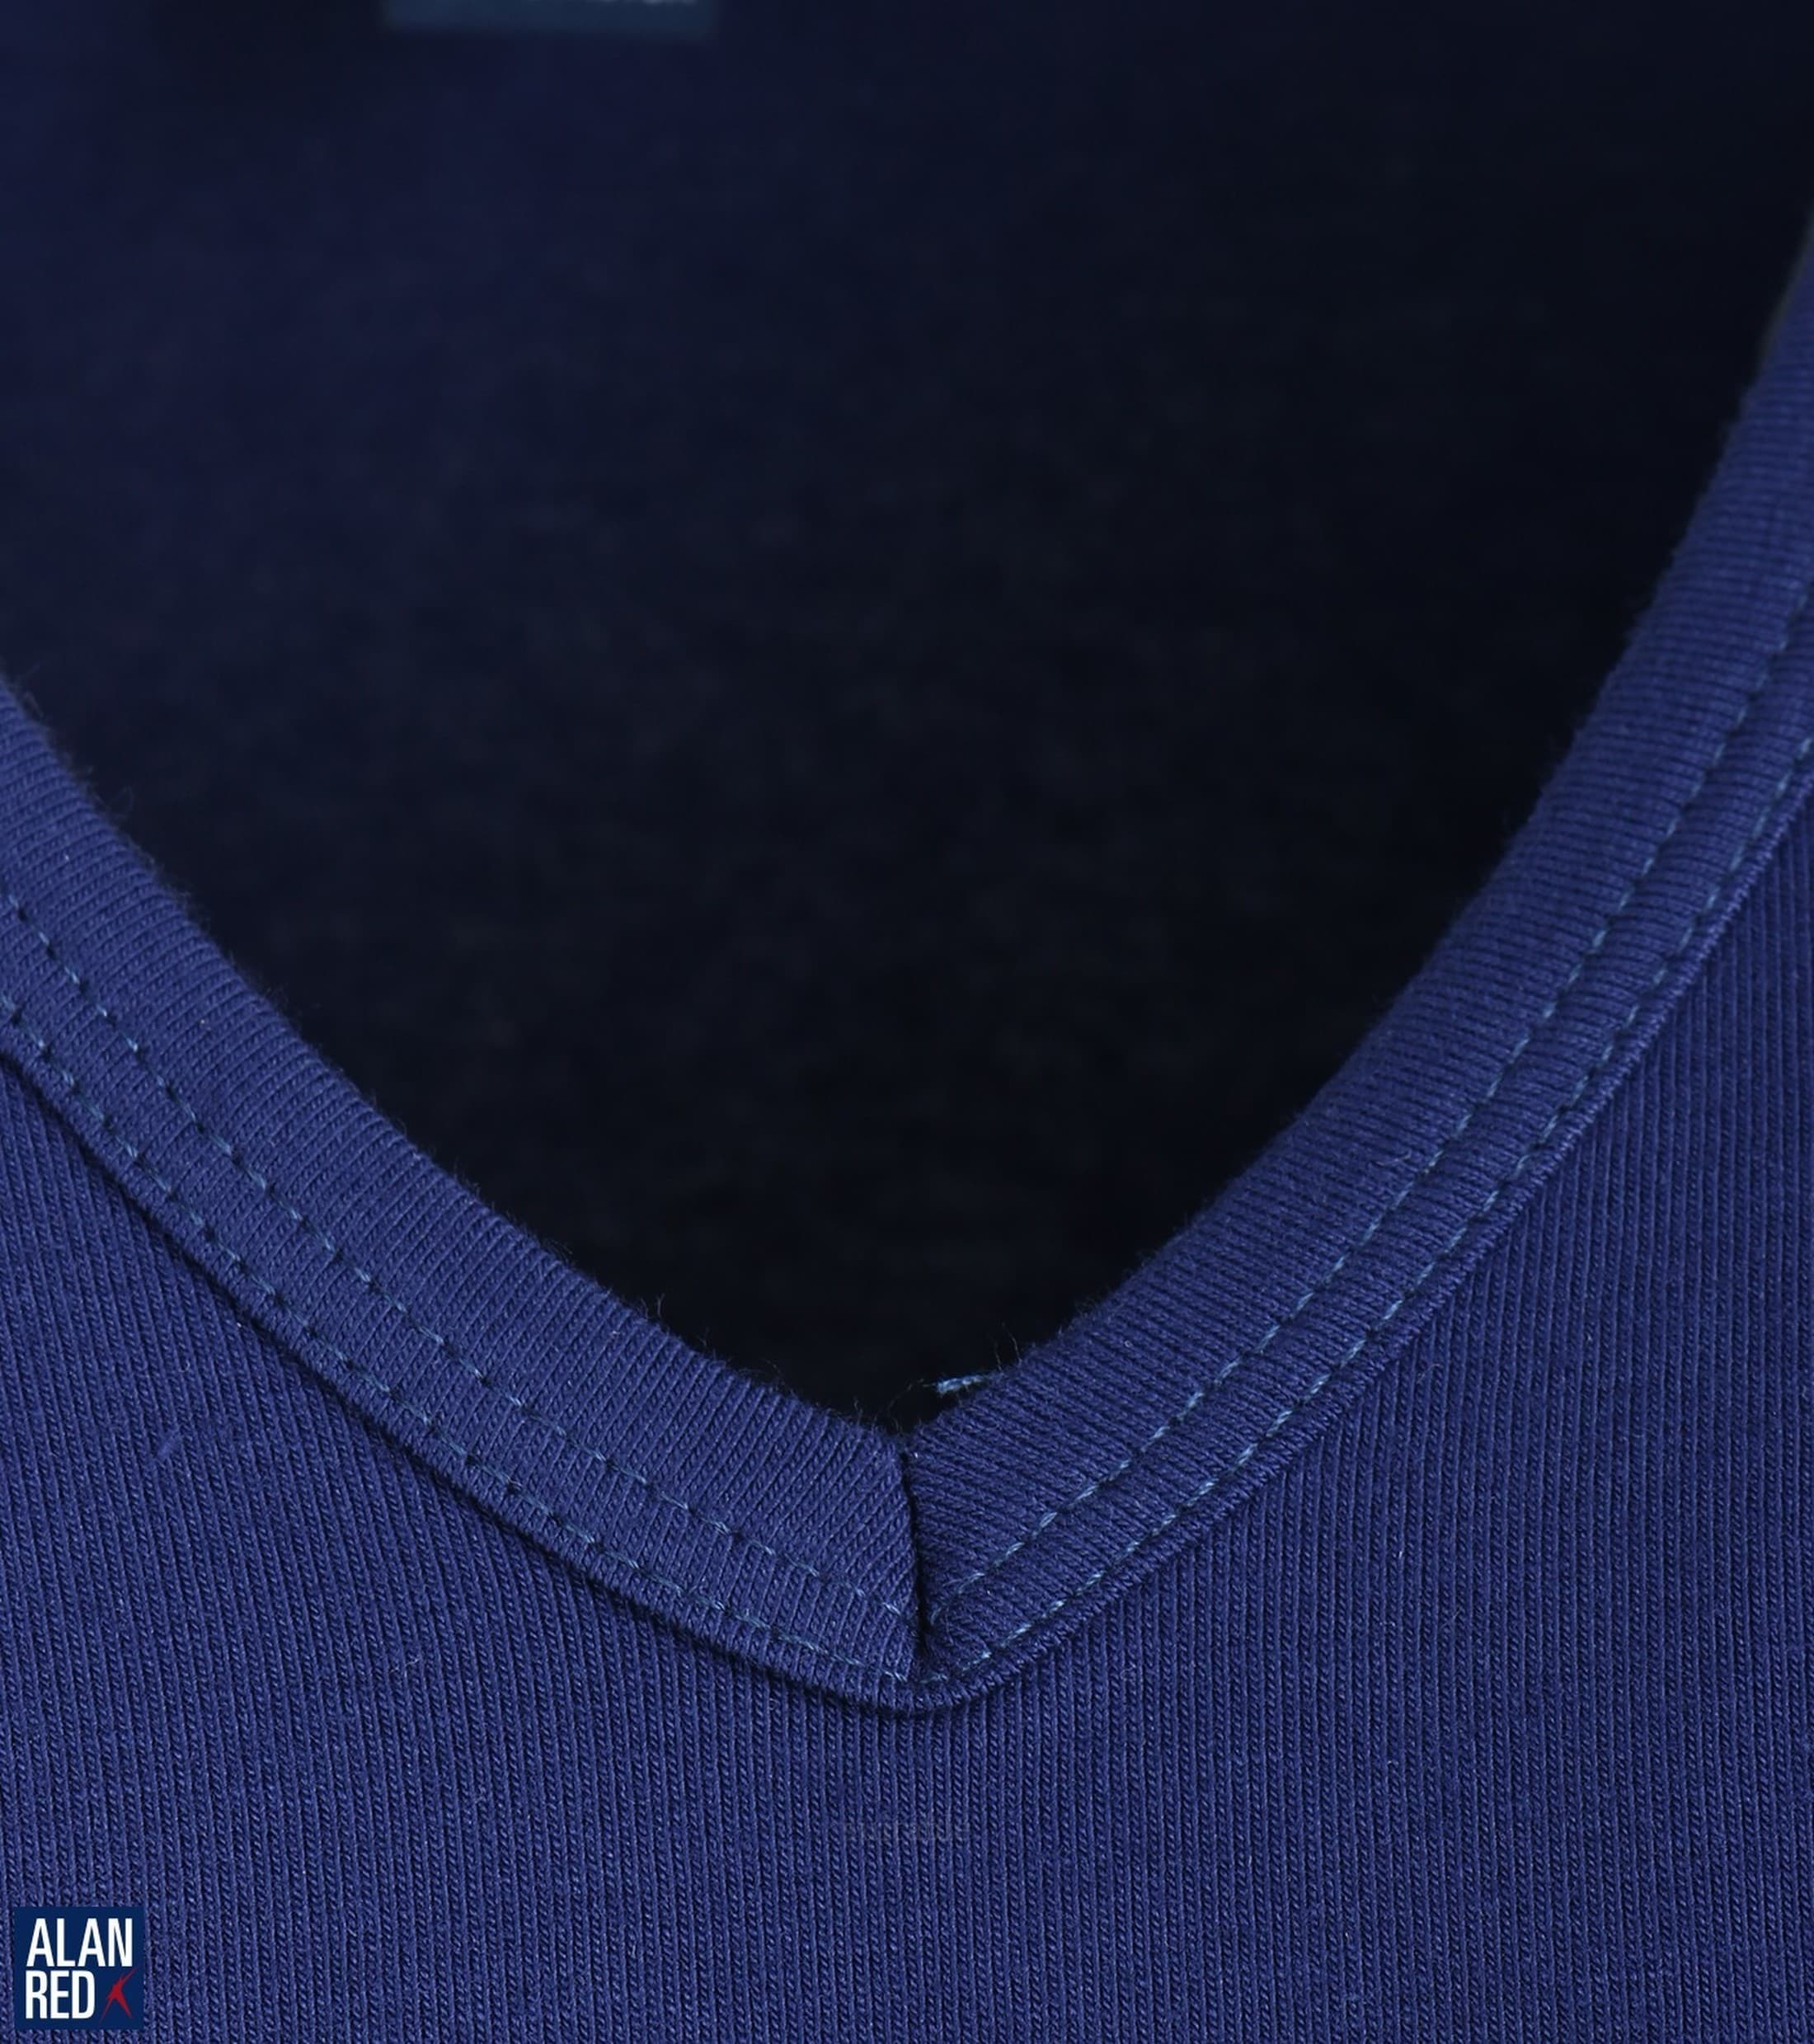 Alan Red Oklahoma T-shirt Stretch Ultramarine 1-Pack foto 1